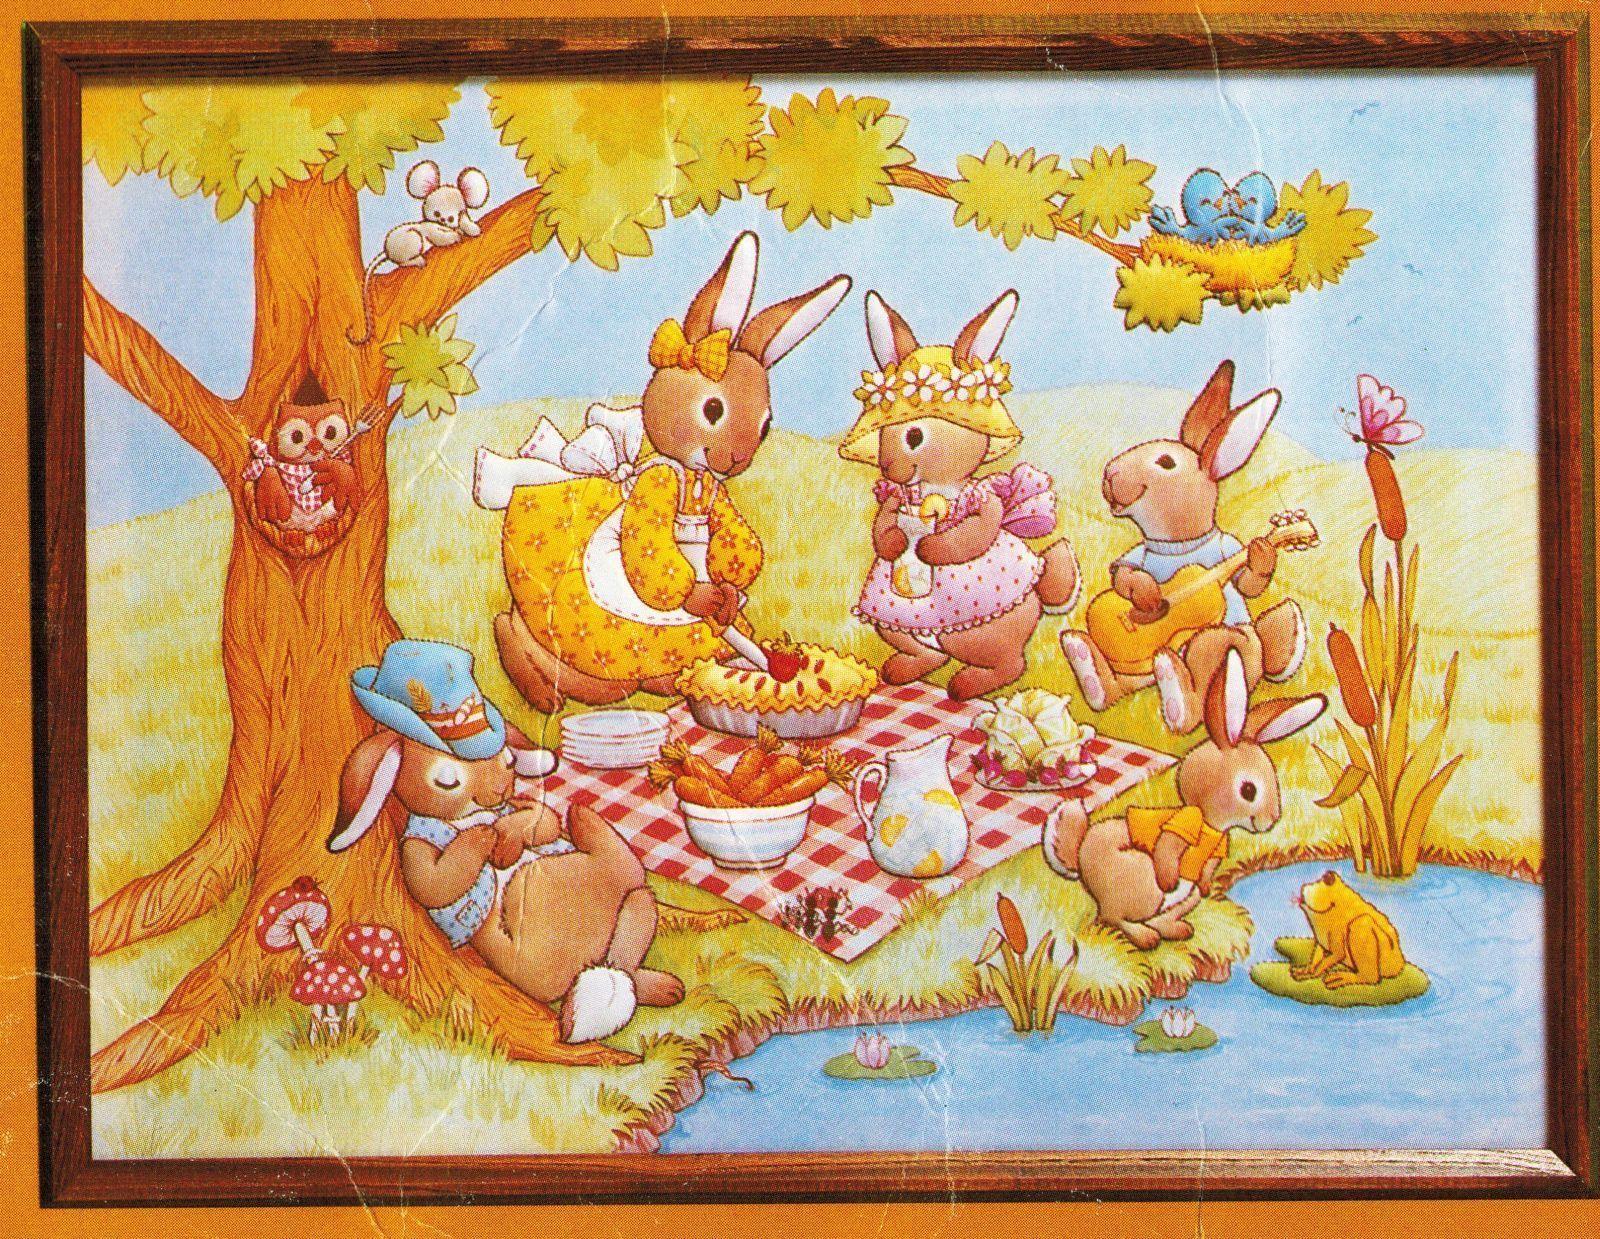 1983 Creative Circle Easter Bunnies Picnic and 25 similar items